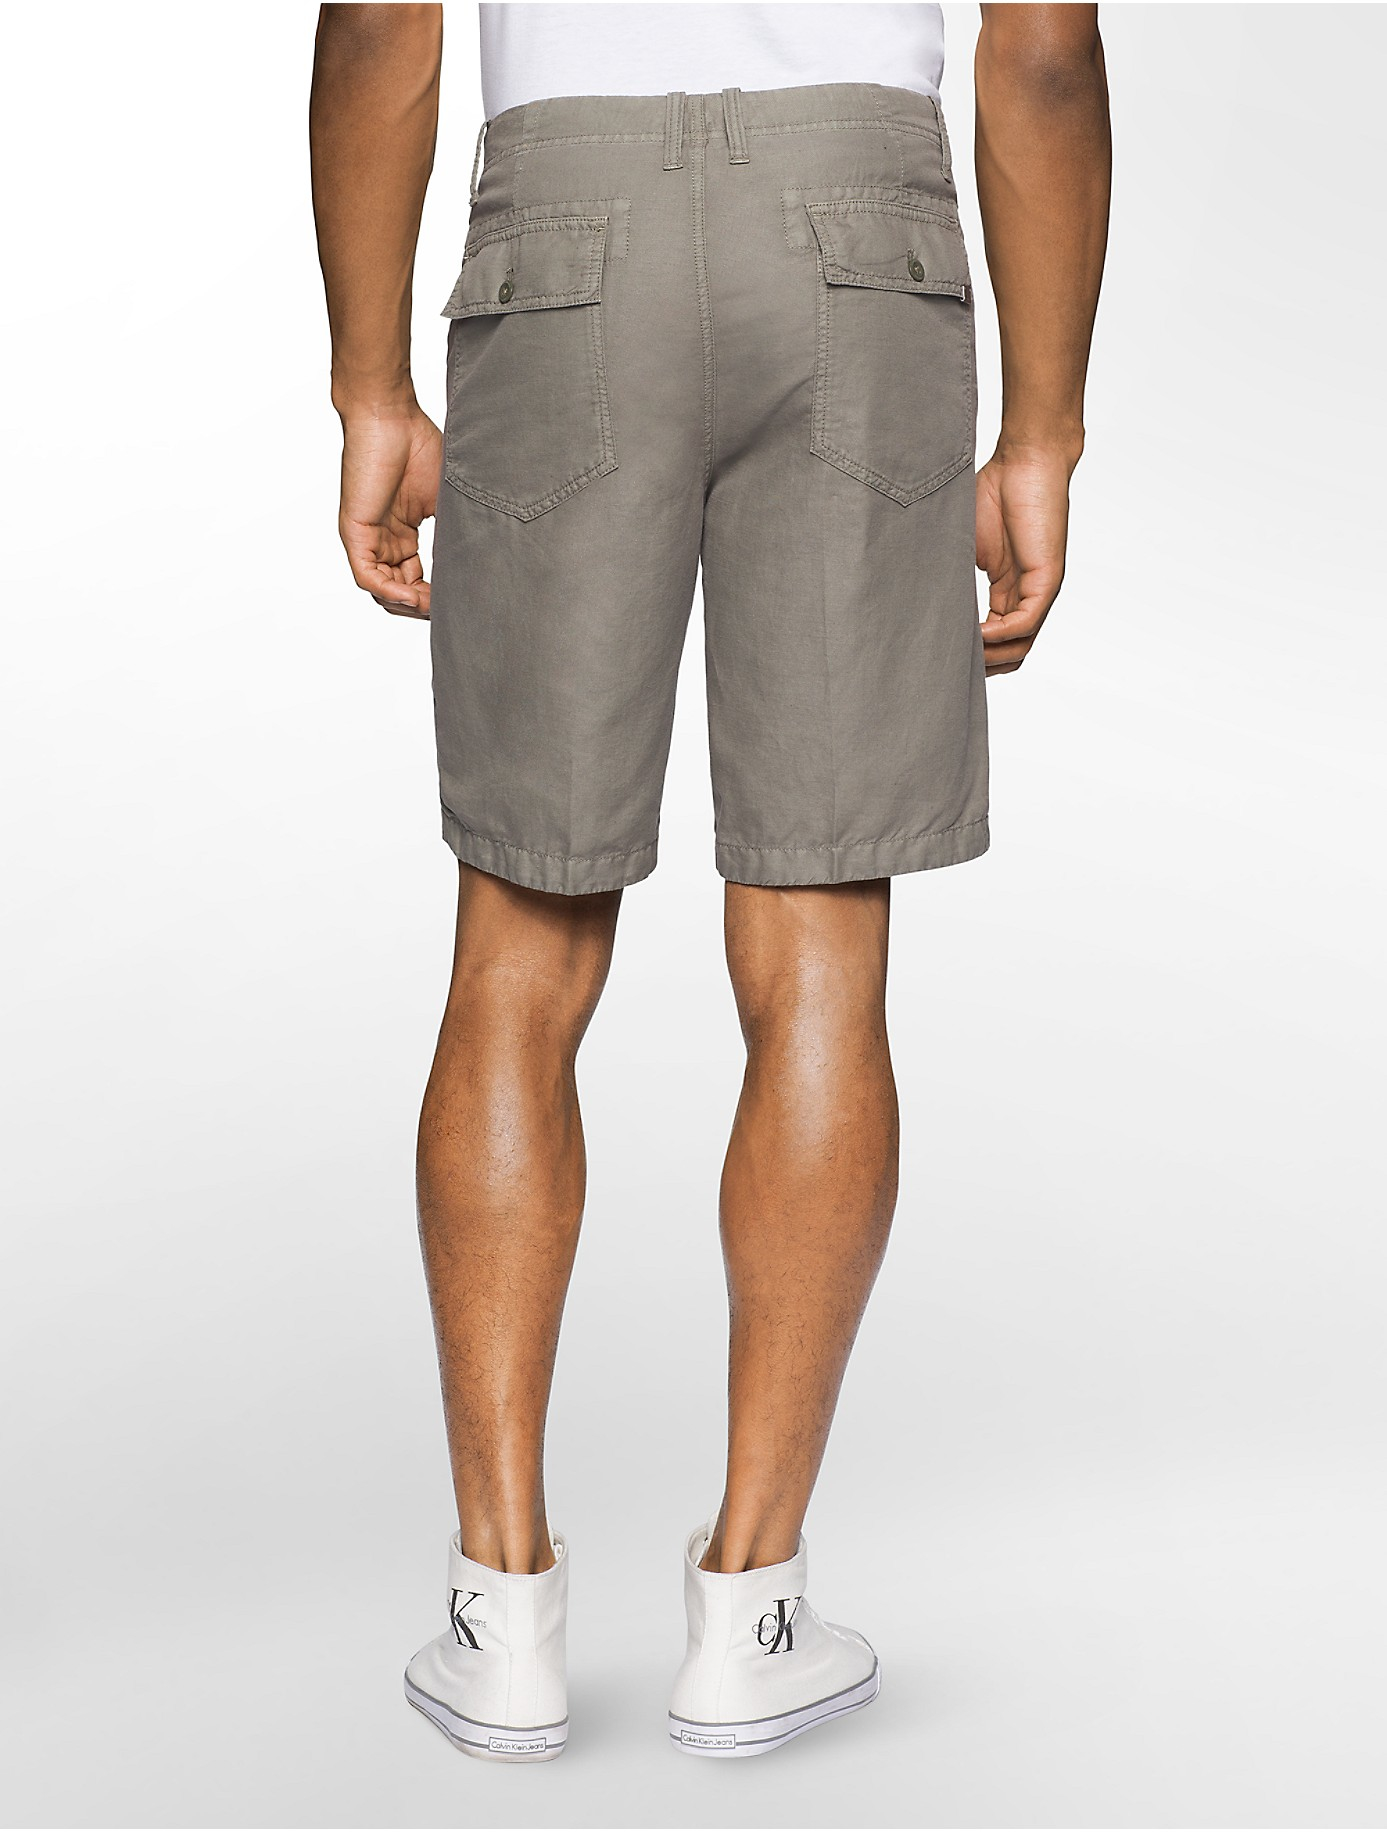 Calvin Klein Linen Lounge Shorts In Gray For Men Lyst